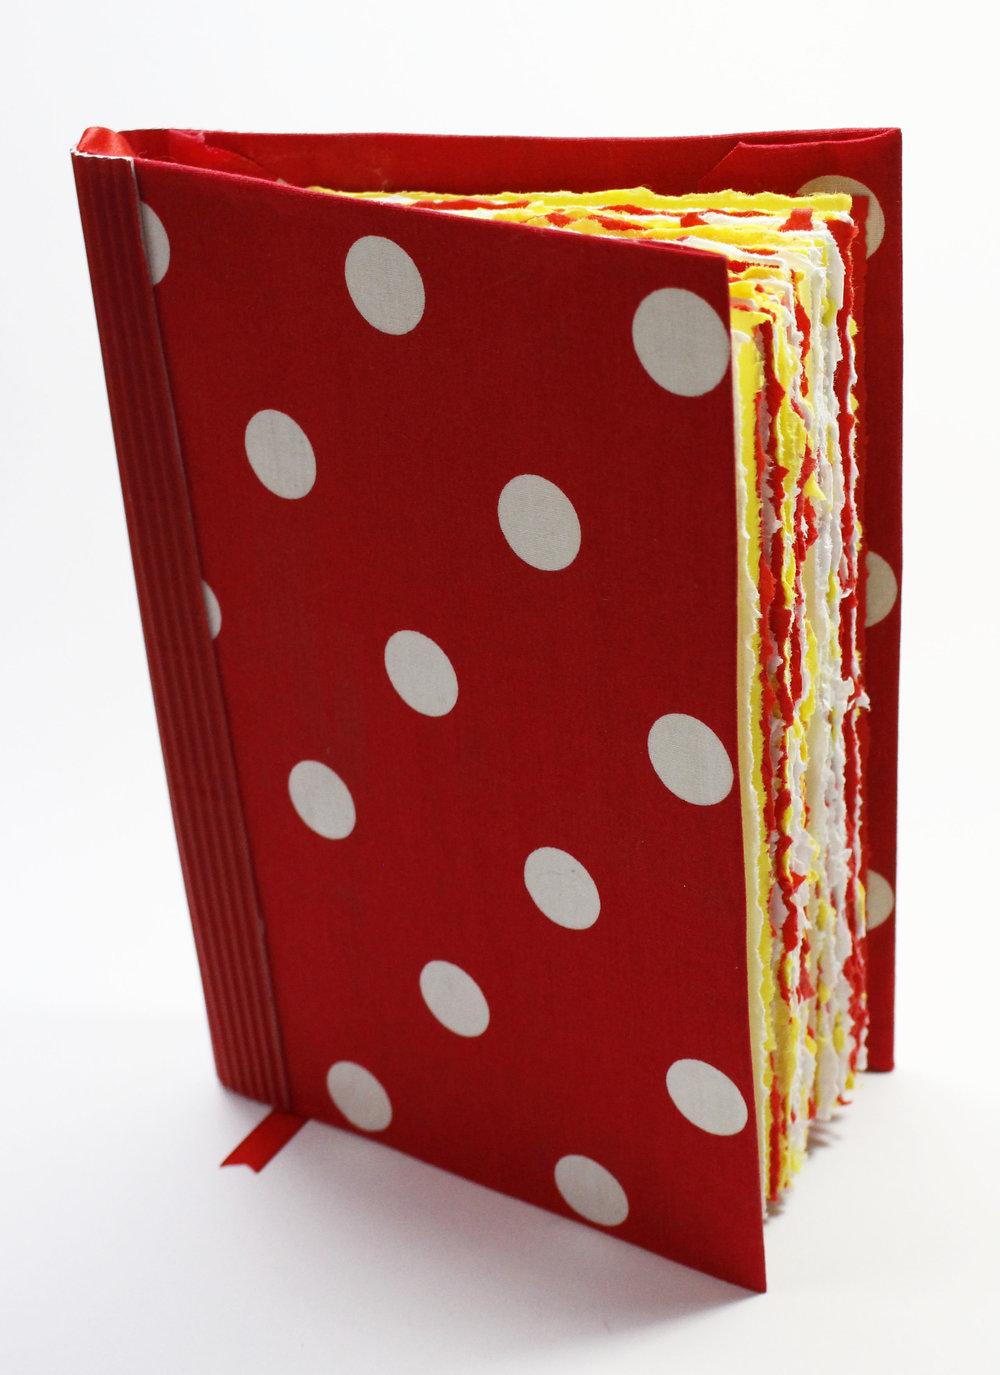 journal-polka-dots-red_7.JPG